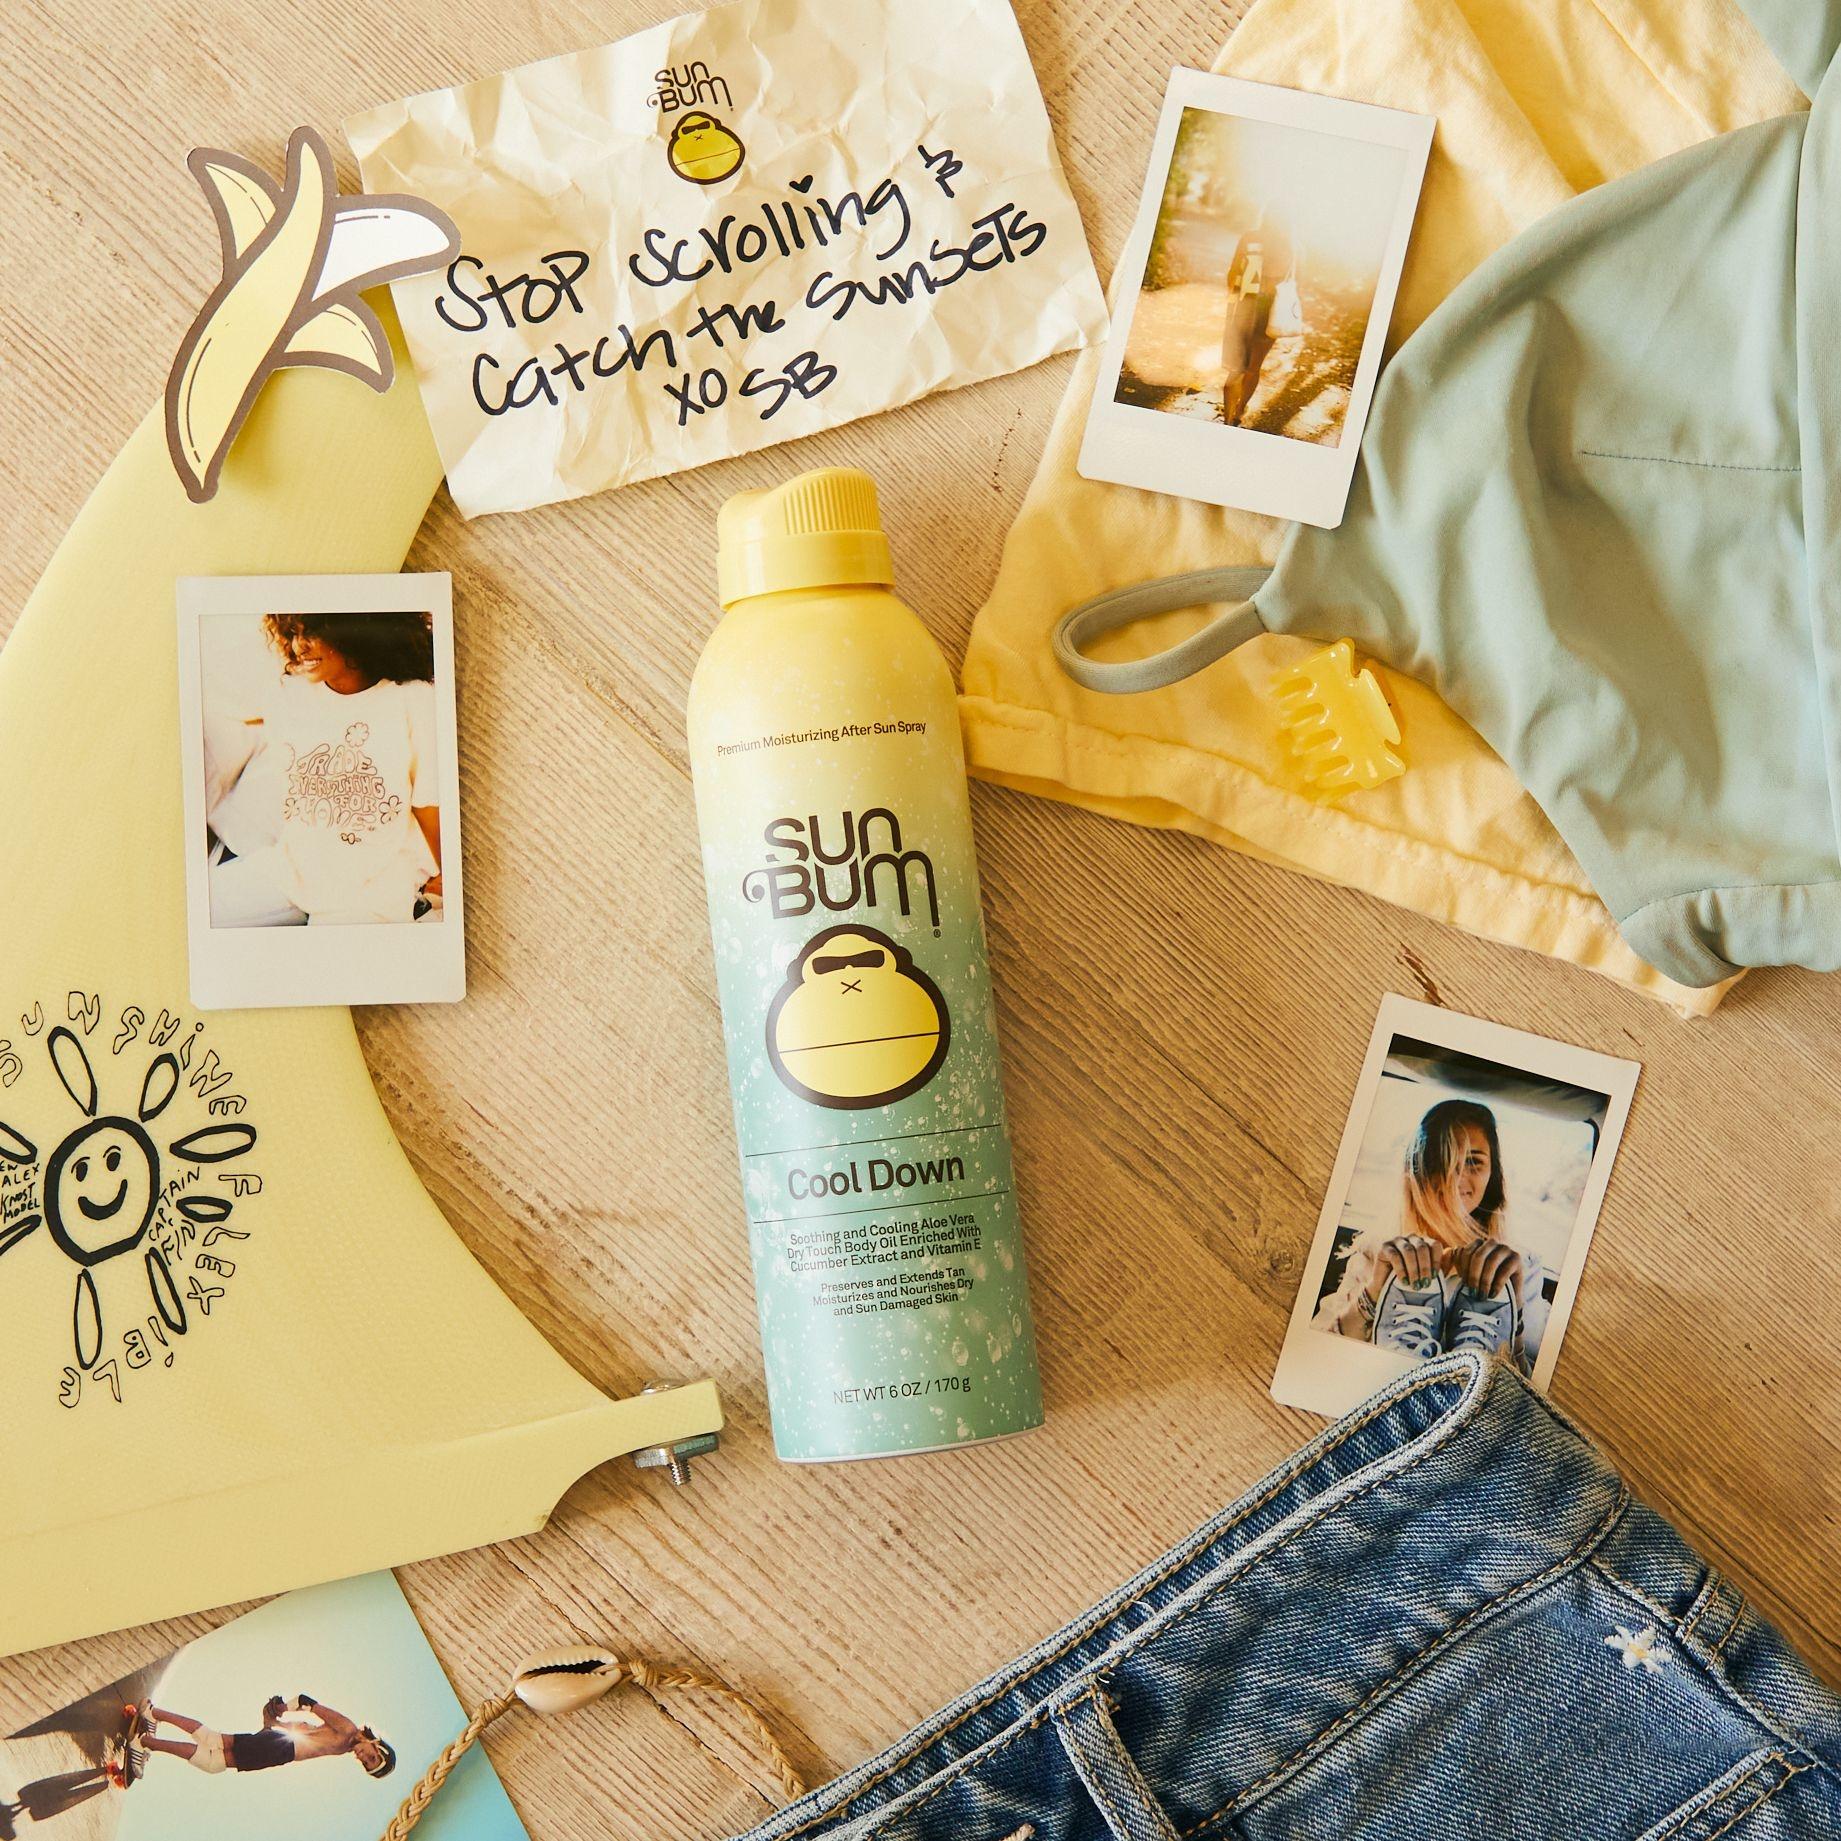 Sun Bum SunBum - Cool Down Spray